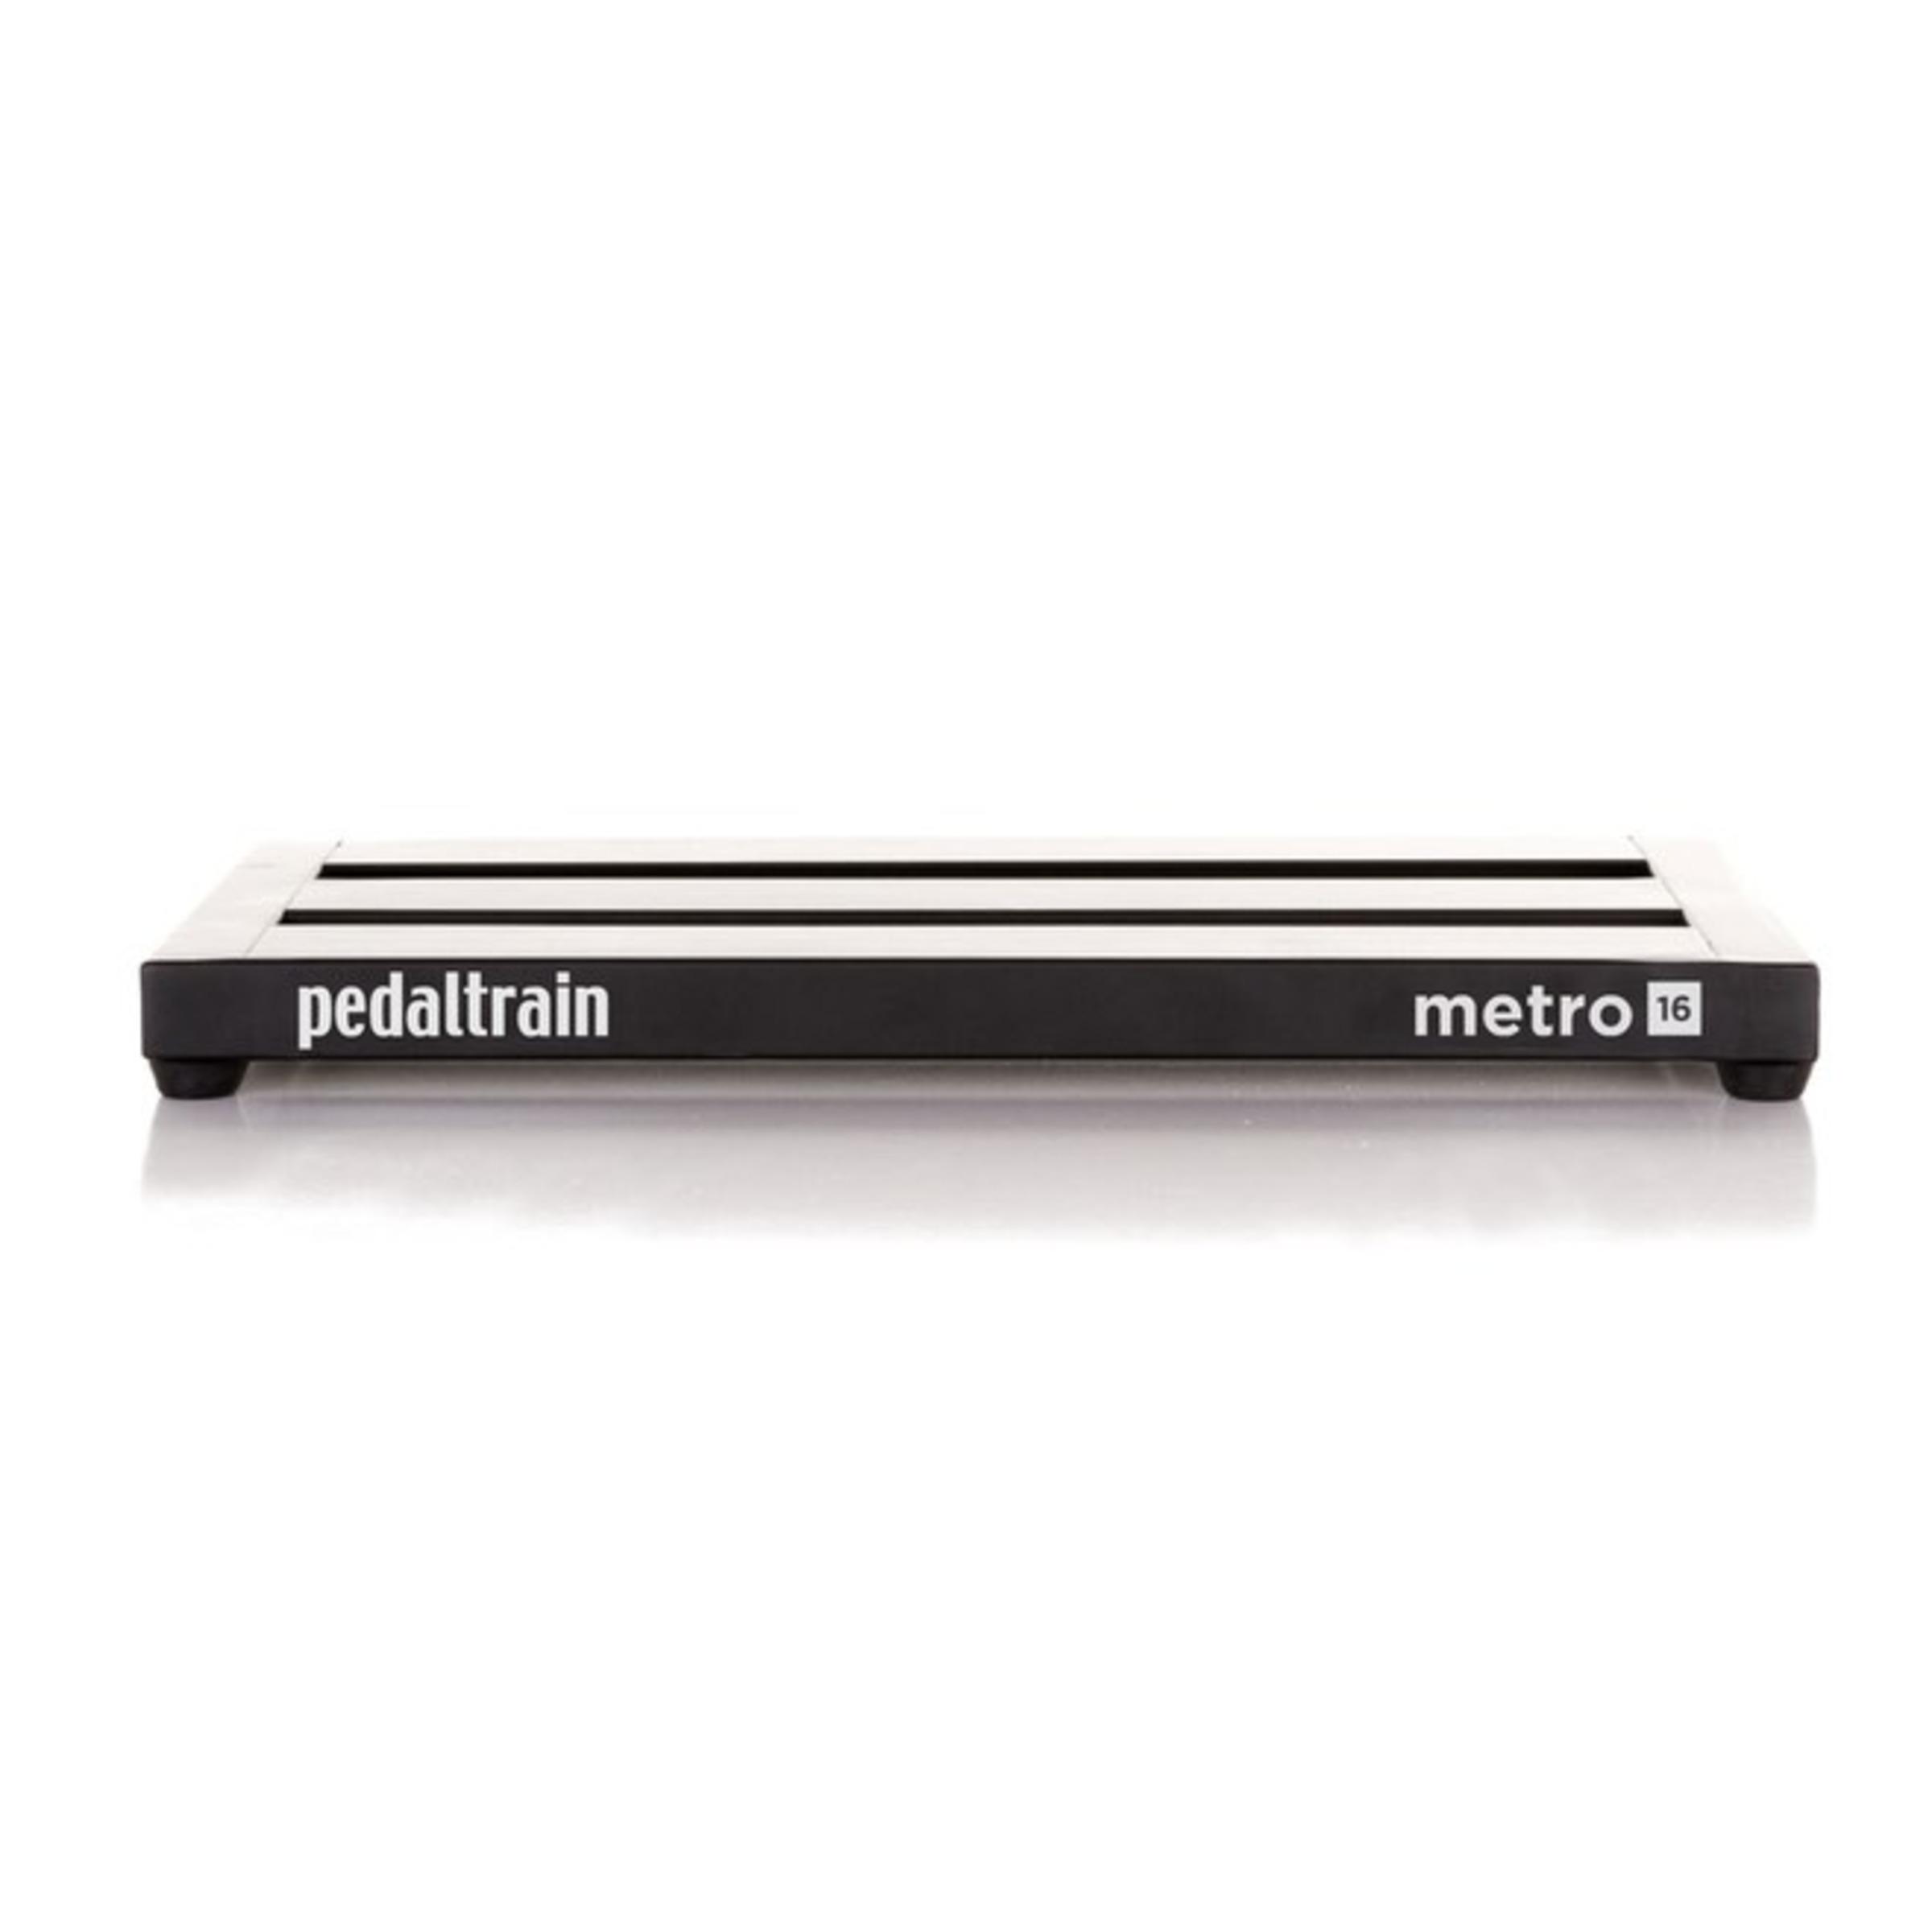 guitars pedaltrain metro 16 pedal board with hard case giggear. Black Bedroom Furniture Sets. Home Design Ideas